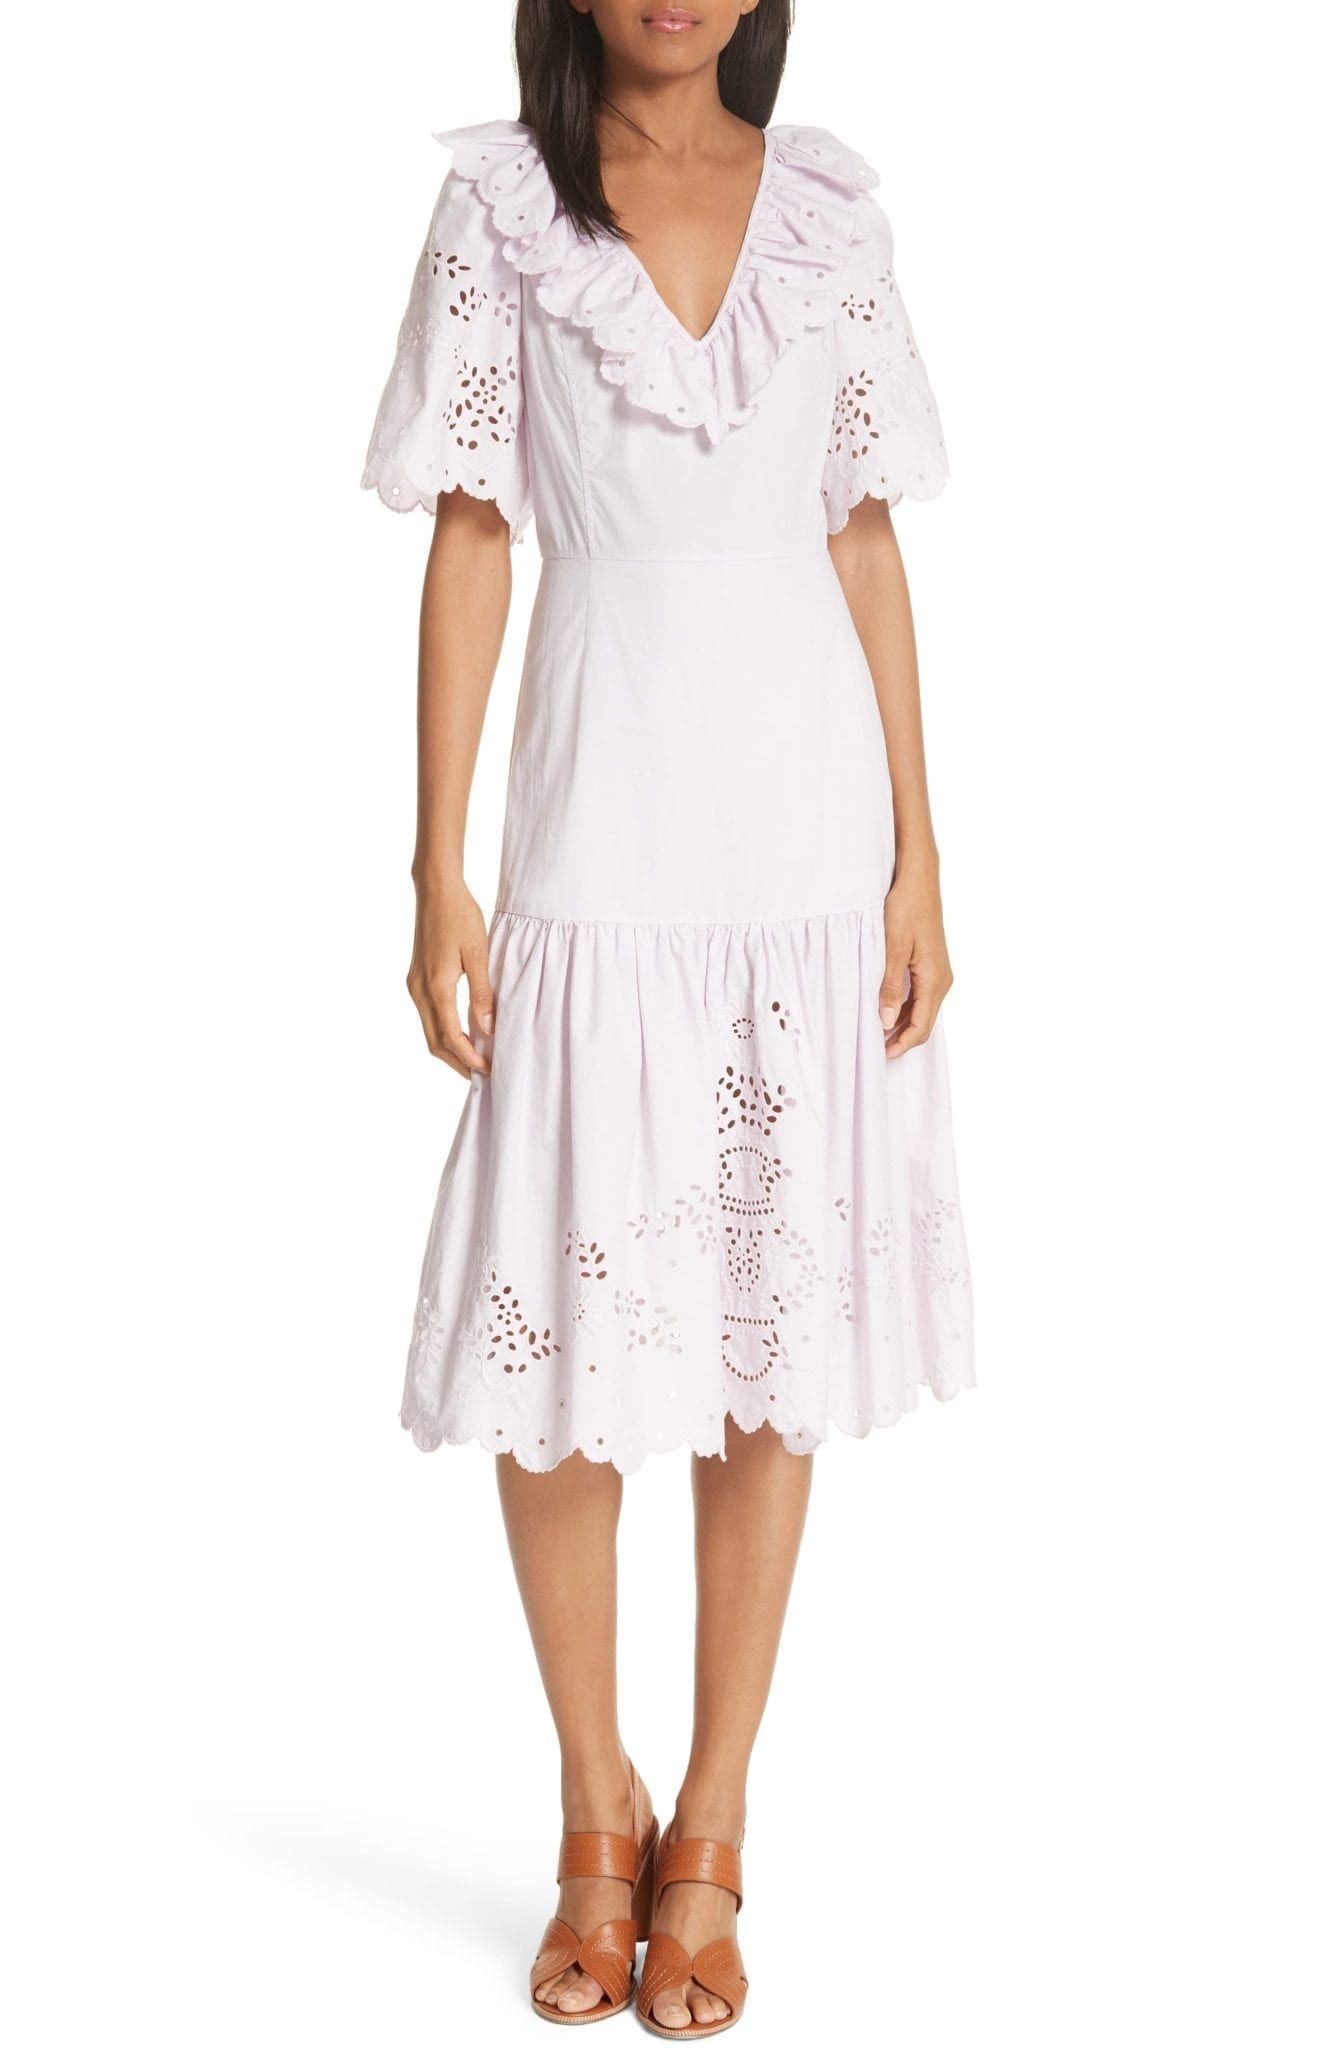 LA VIE REBECCA TAYLOR Eyelet Poplin Midi Lilac Dress